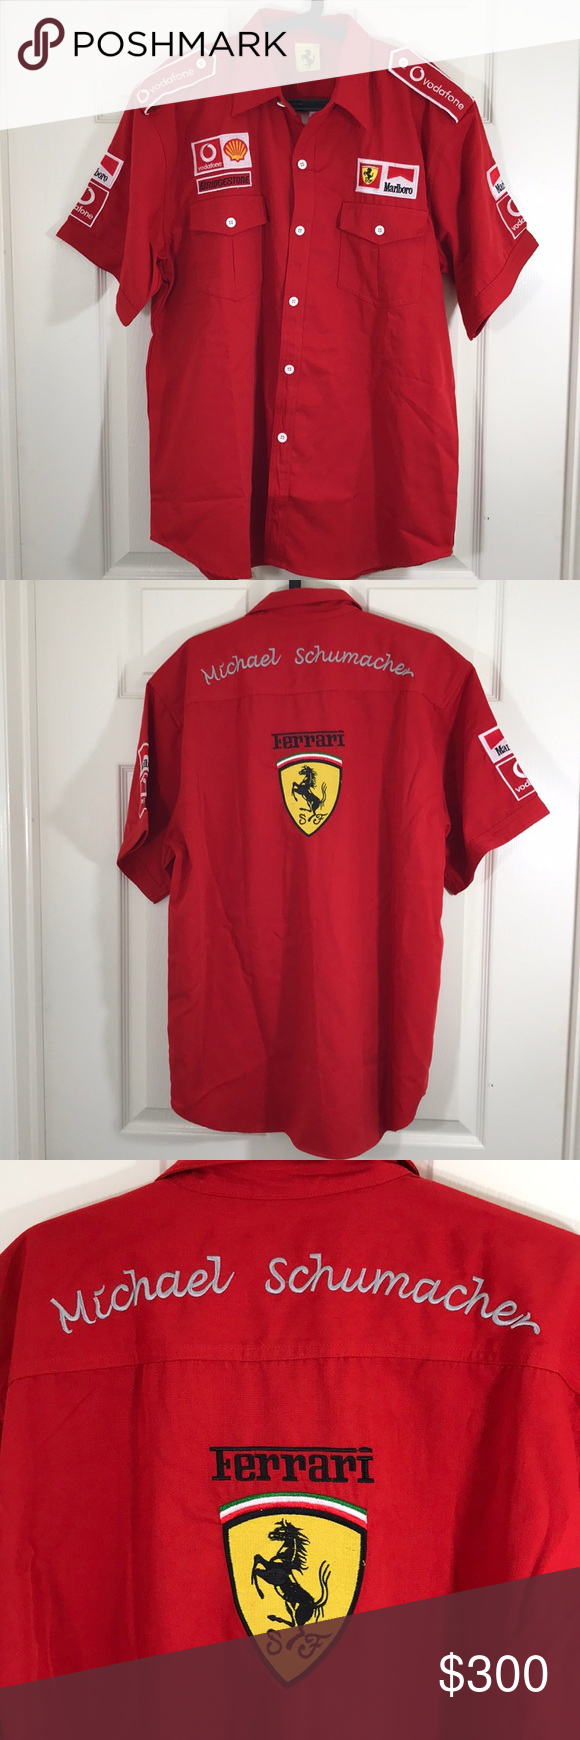 Rare Ferrari Michael Schumacher Pitcrew Shirt Nwot Shirts Pit Crew Shirts Casual Shirts